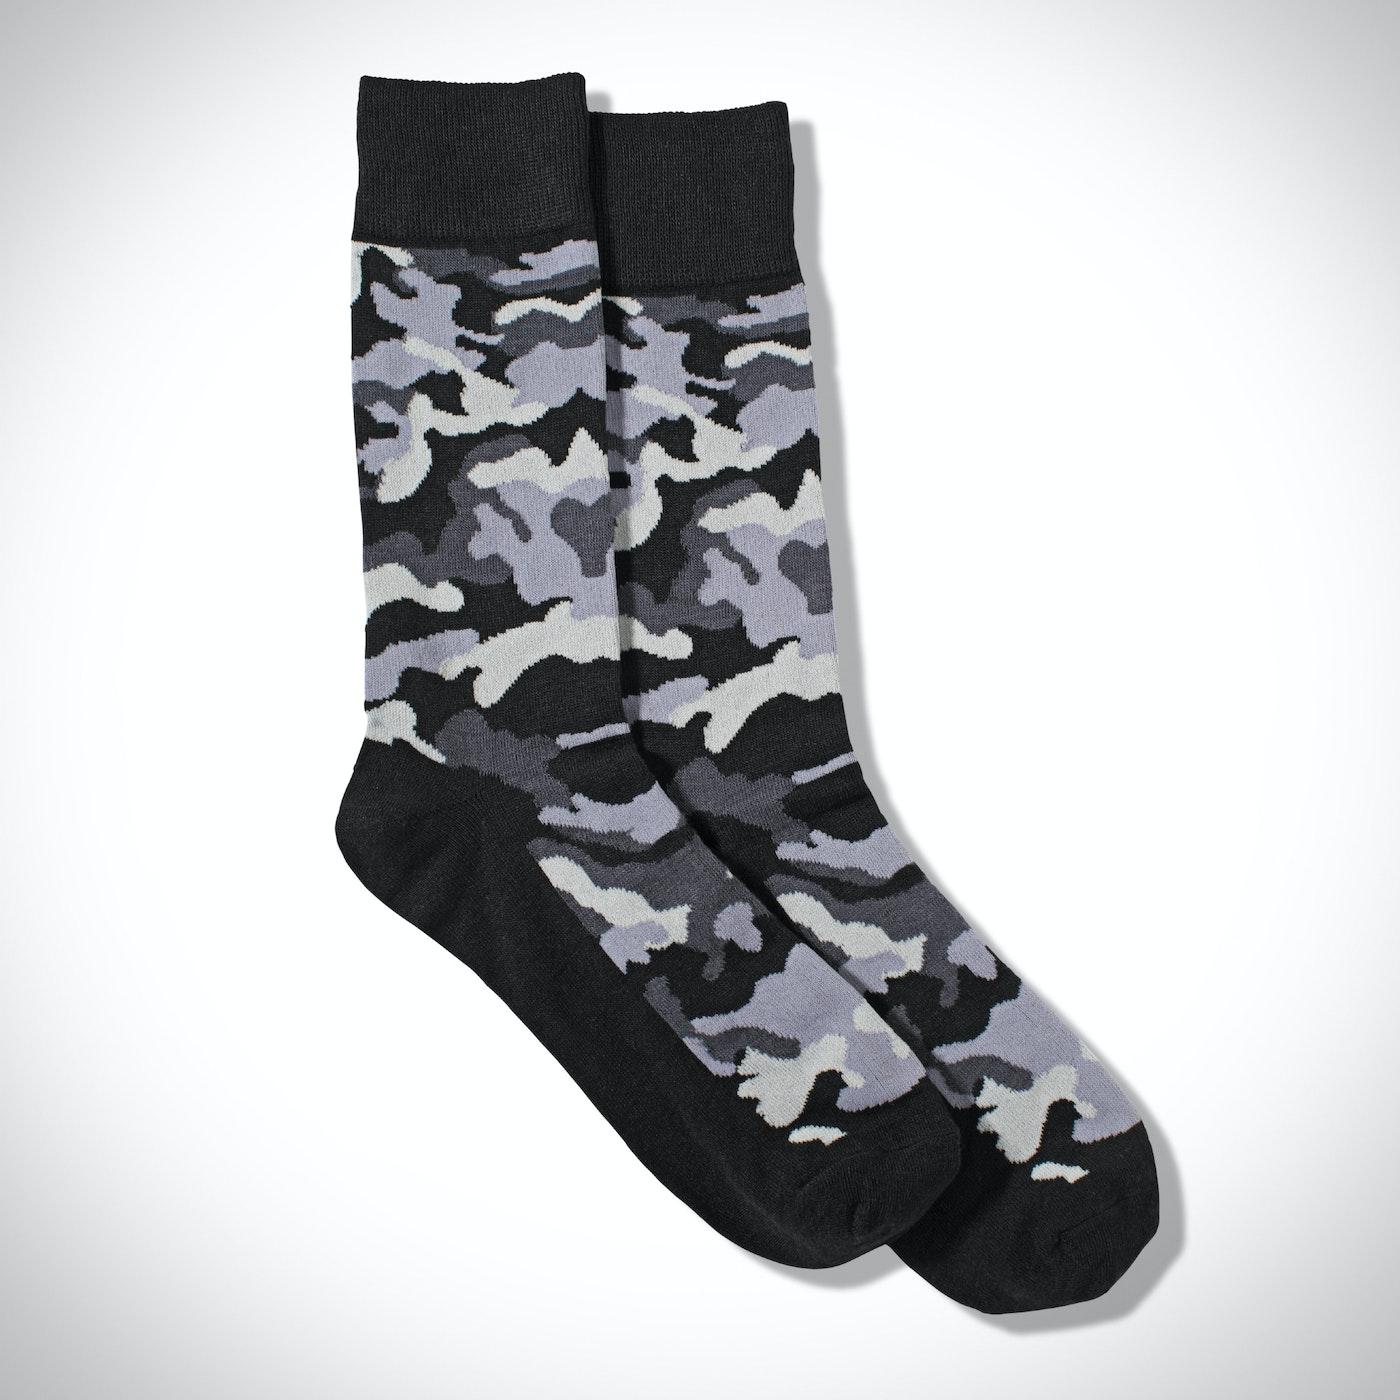 Gray Camo Socks